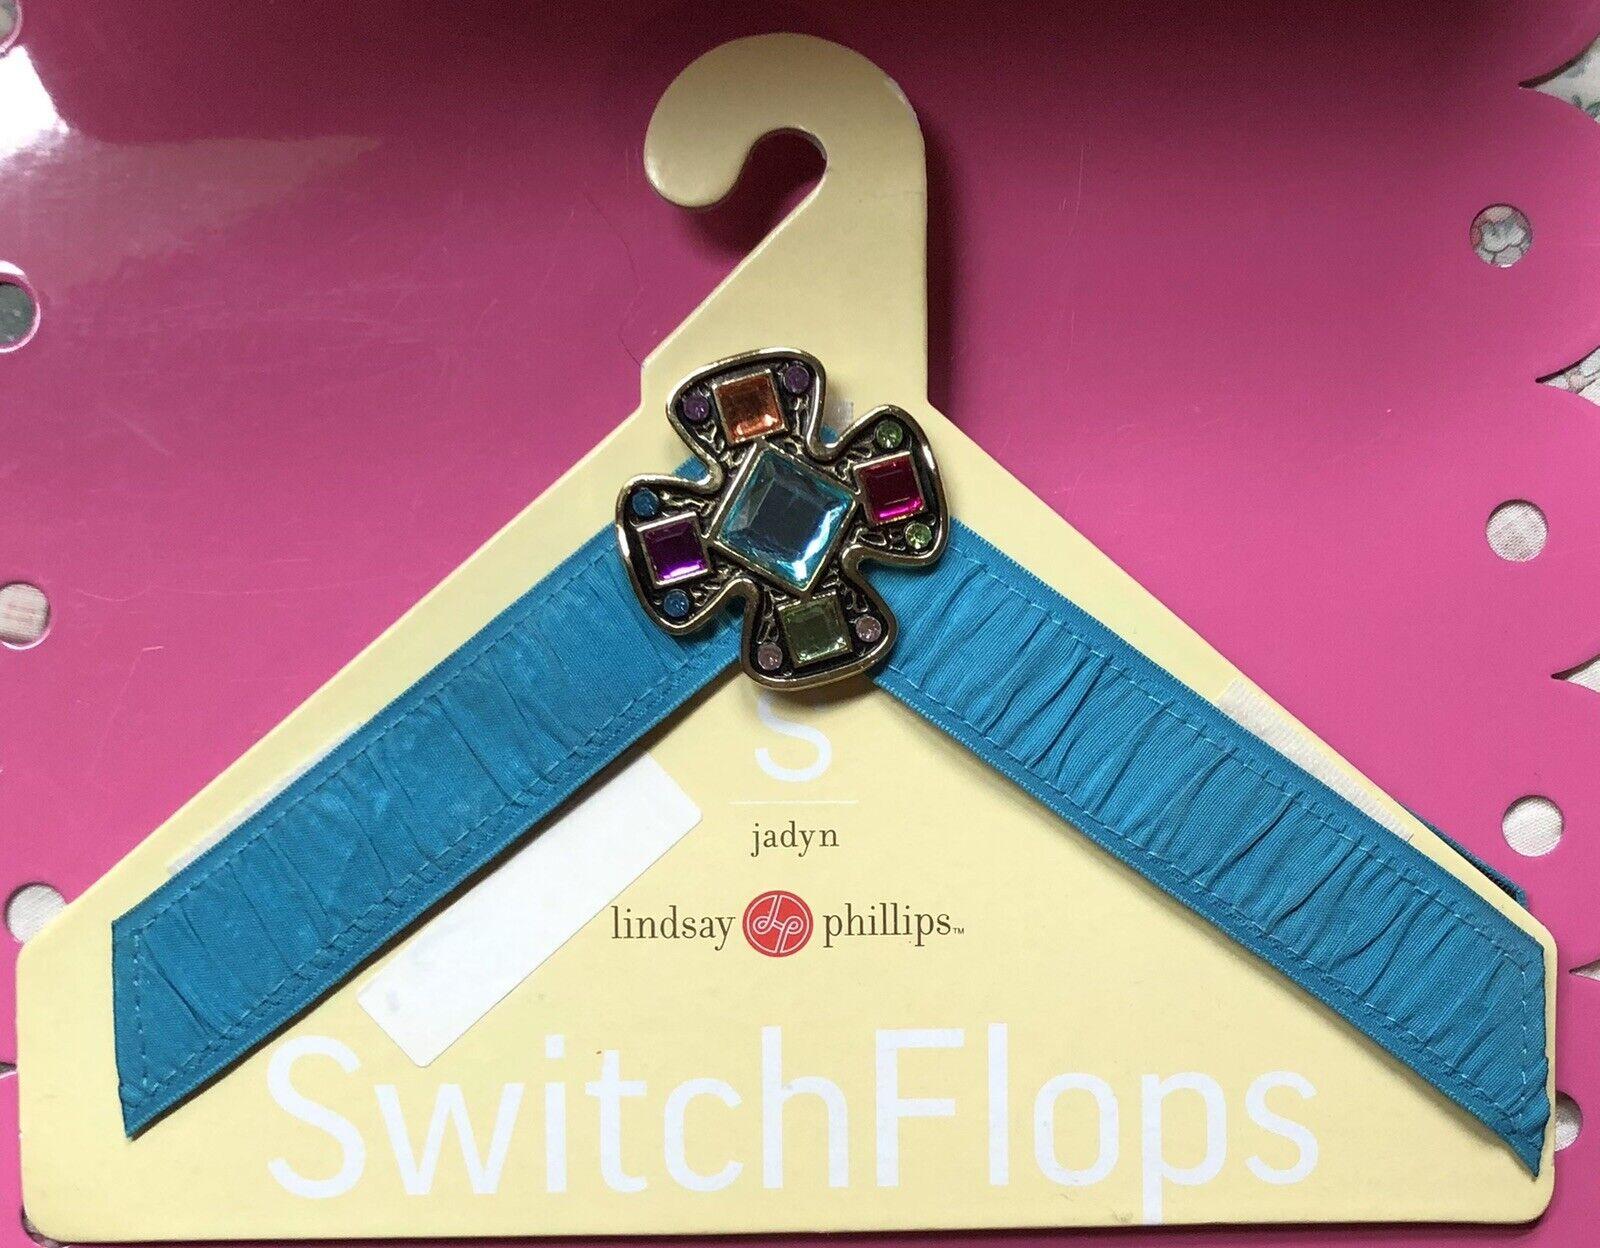 lindsay phillips switchflops straps Small 5-6 Jadyn